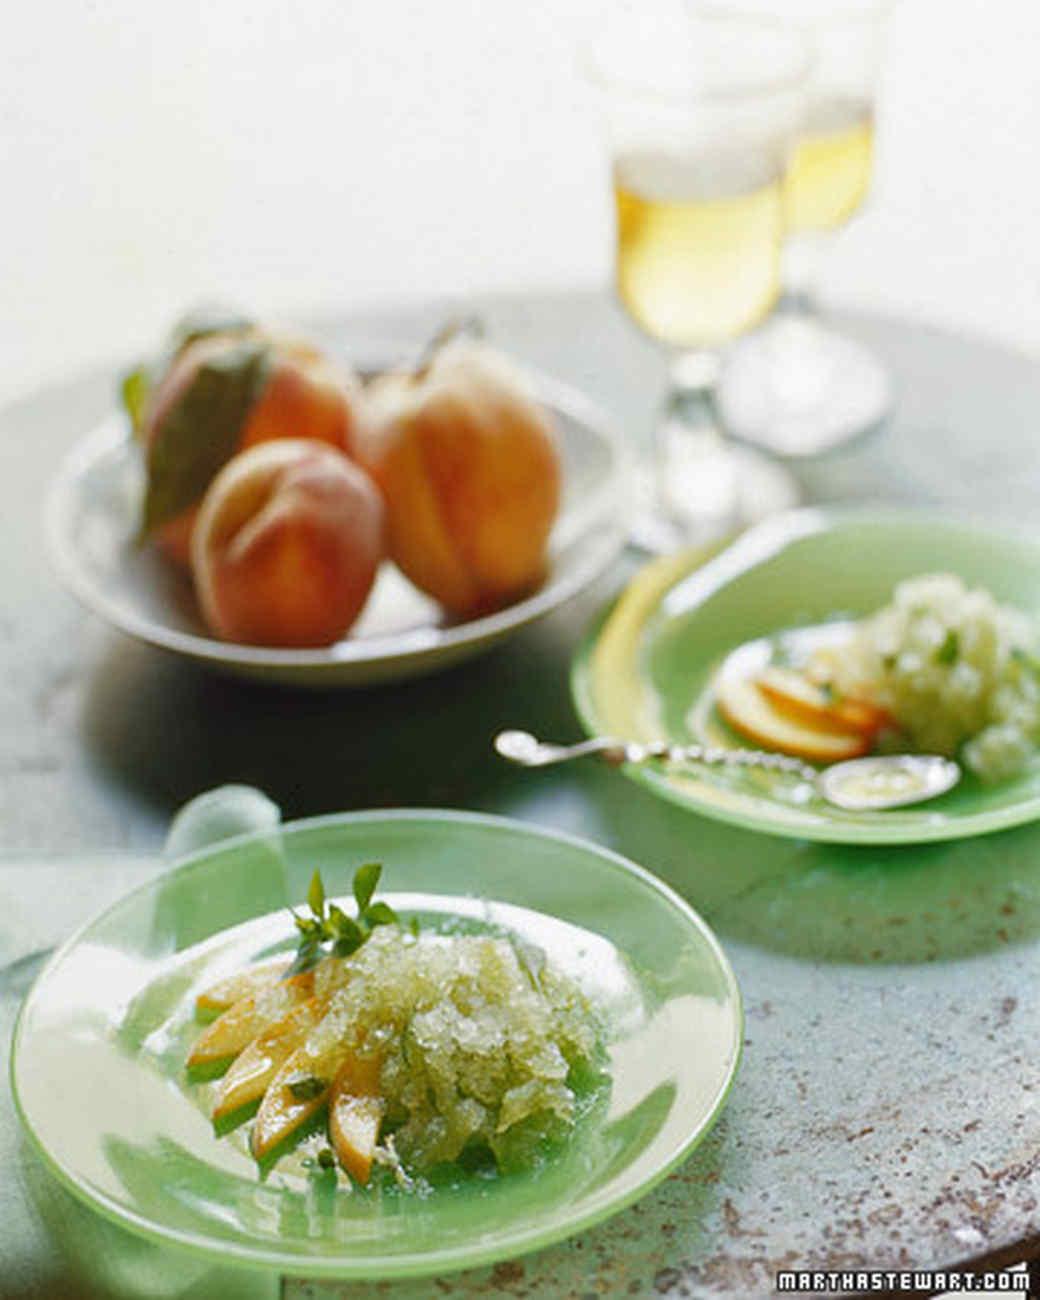 Basil Granita with Peaches